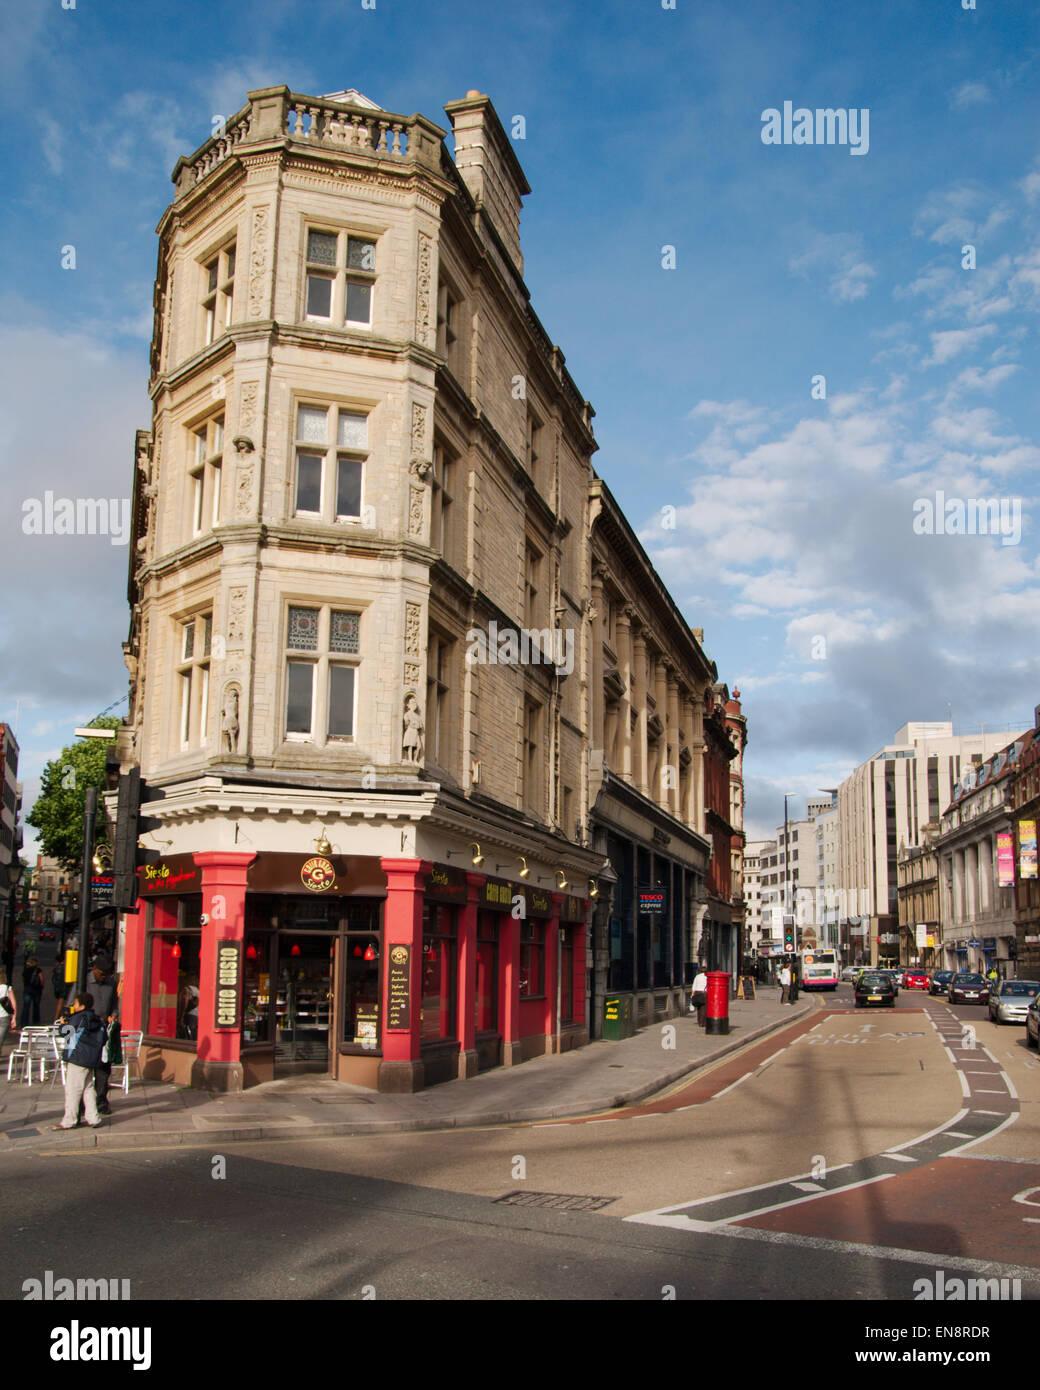 Clare Street, Bristol, England Stock Photo: 81943283 - Alamy